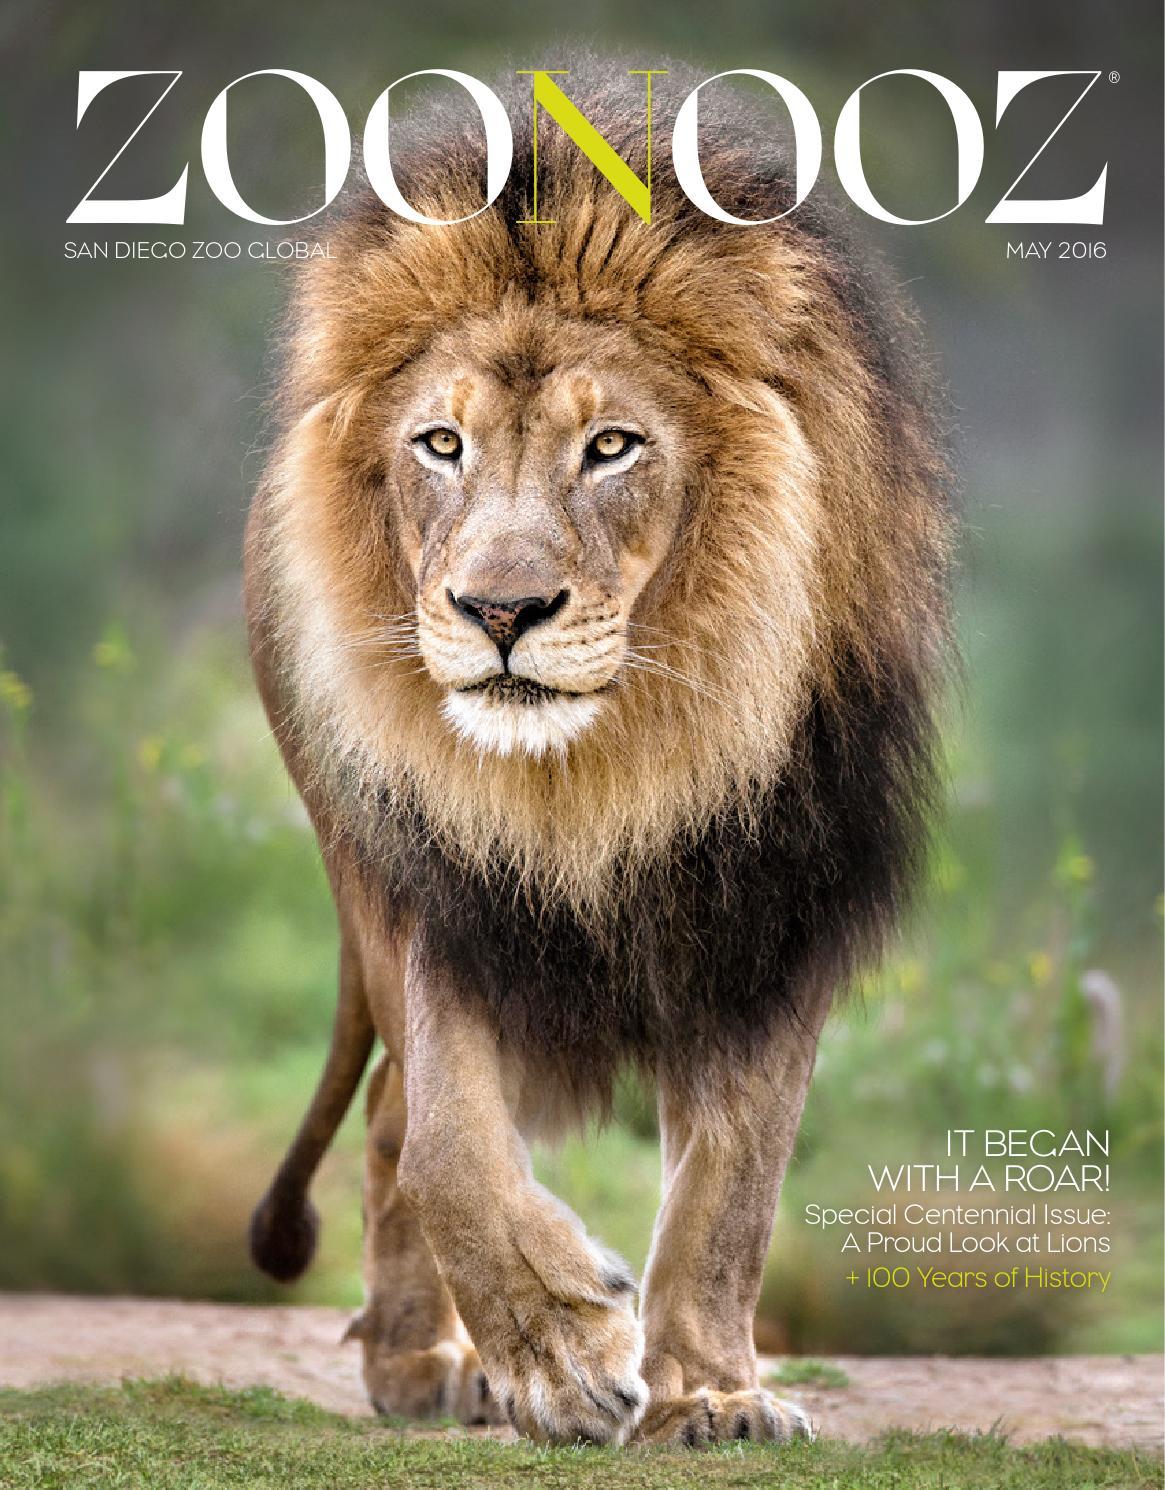 Zoonooz May 2016 By San Diego Zoo Global Issuu